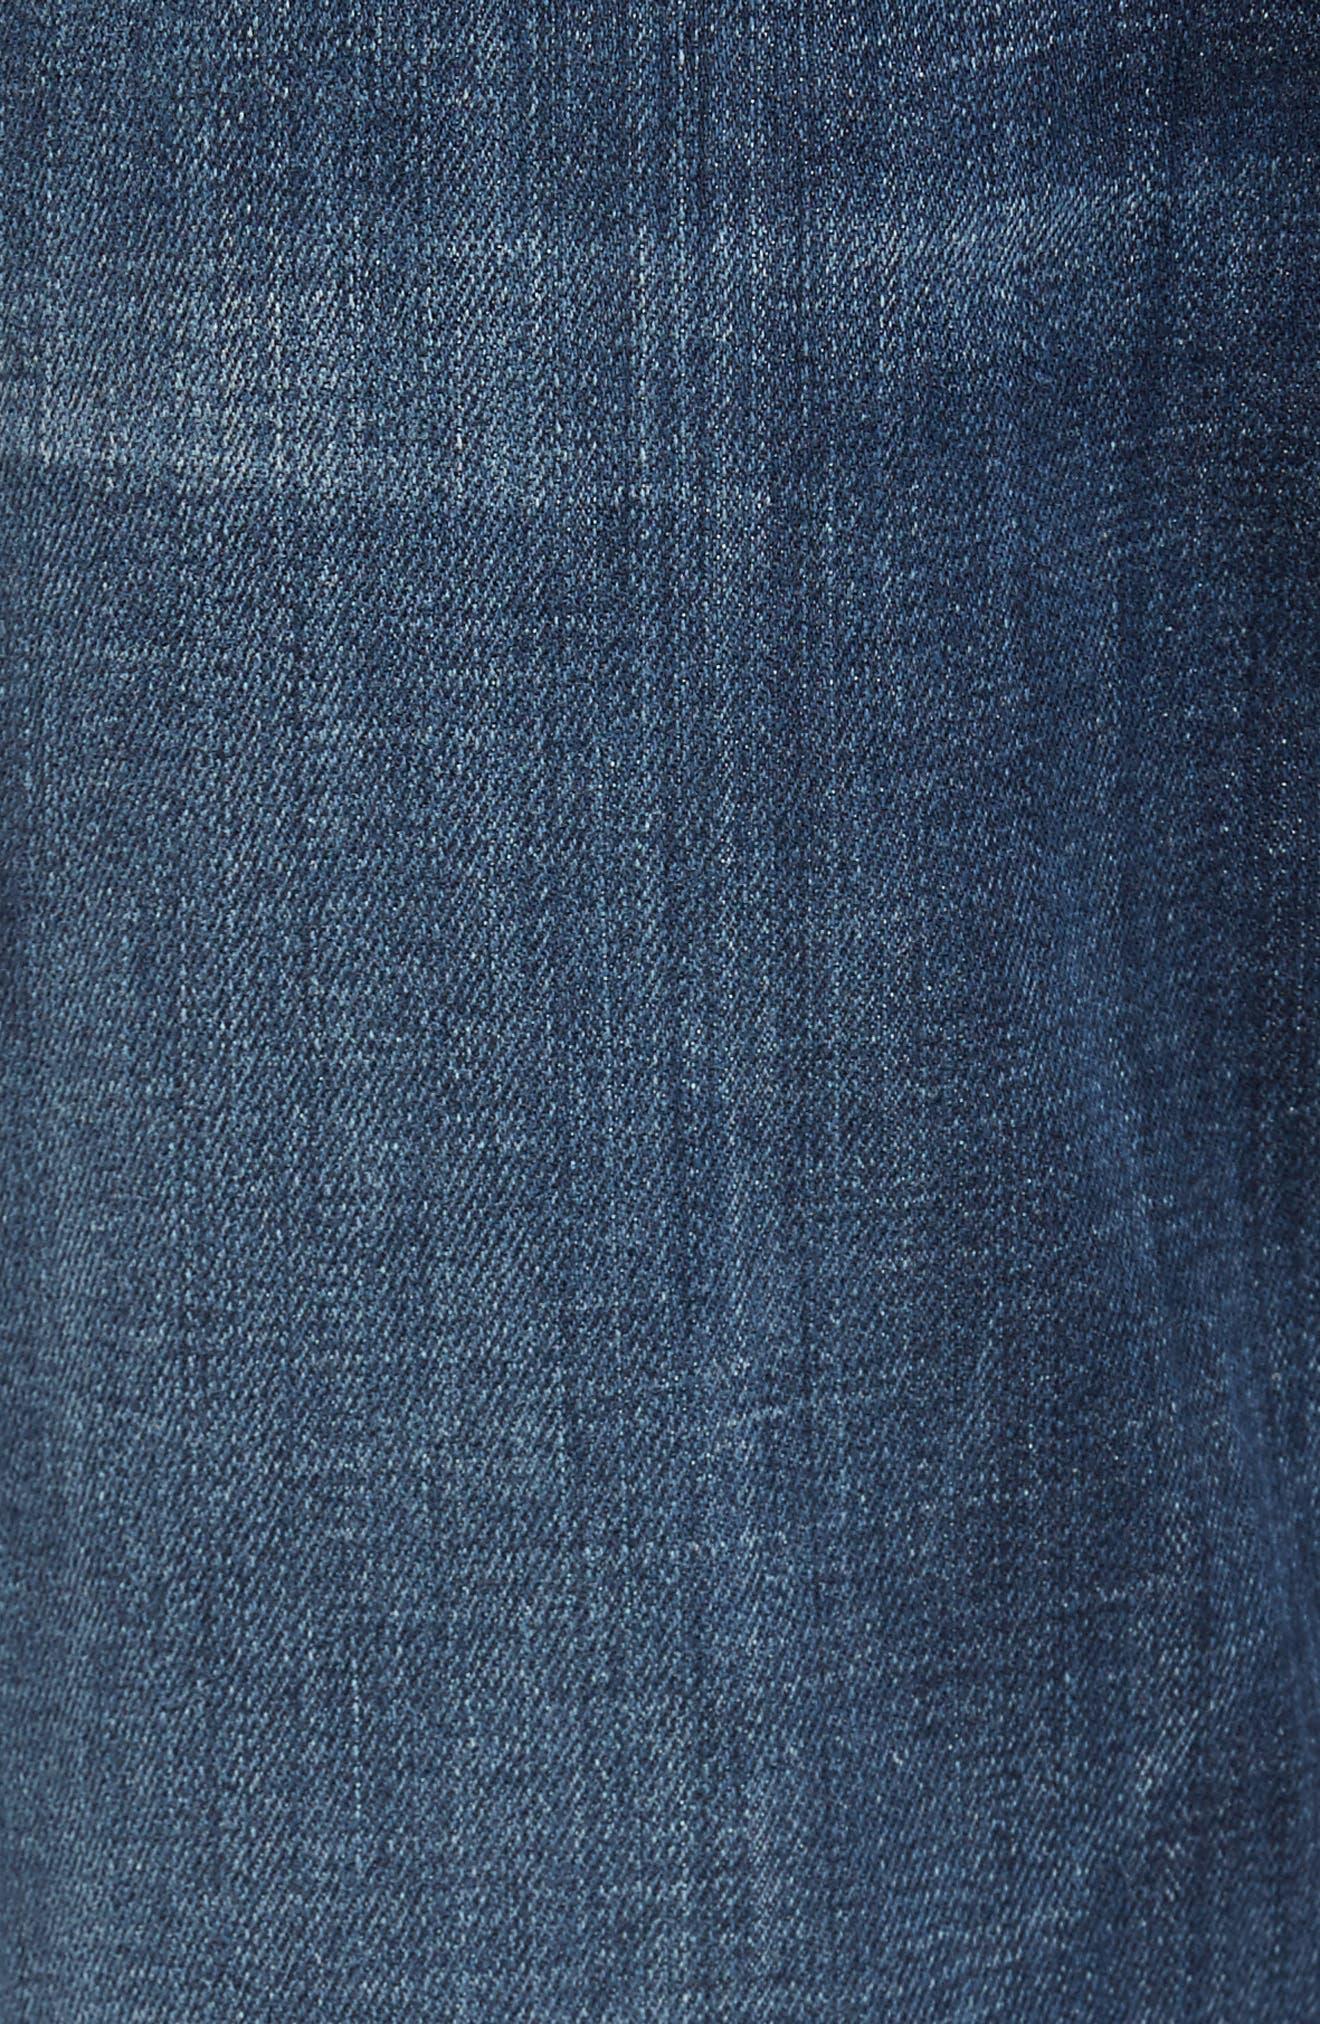 Byron Slim Straight Leg Jean,                             Alternate thumbnail 5, color,                             499